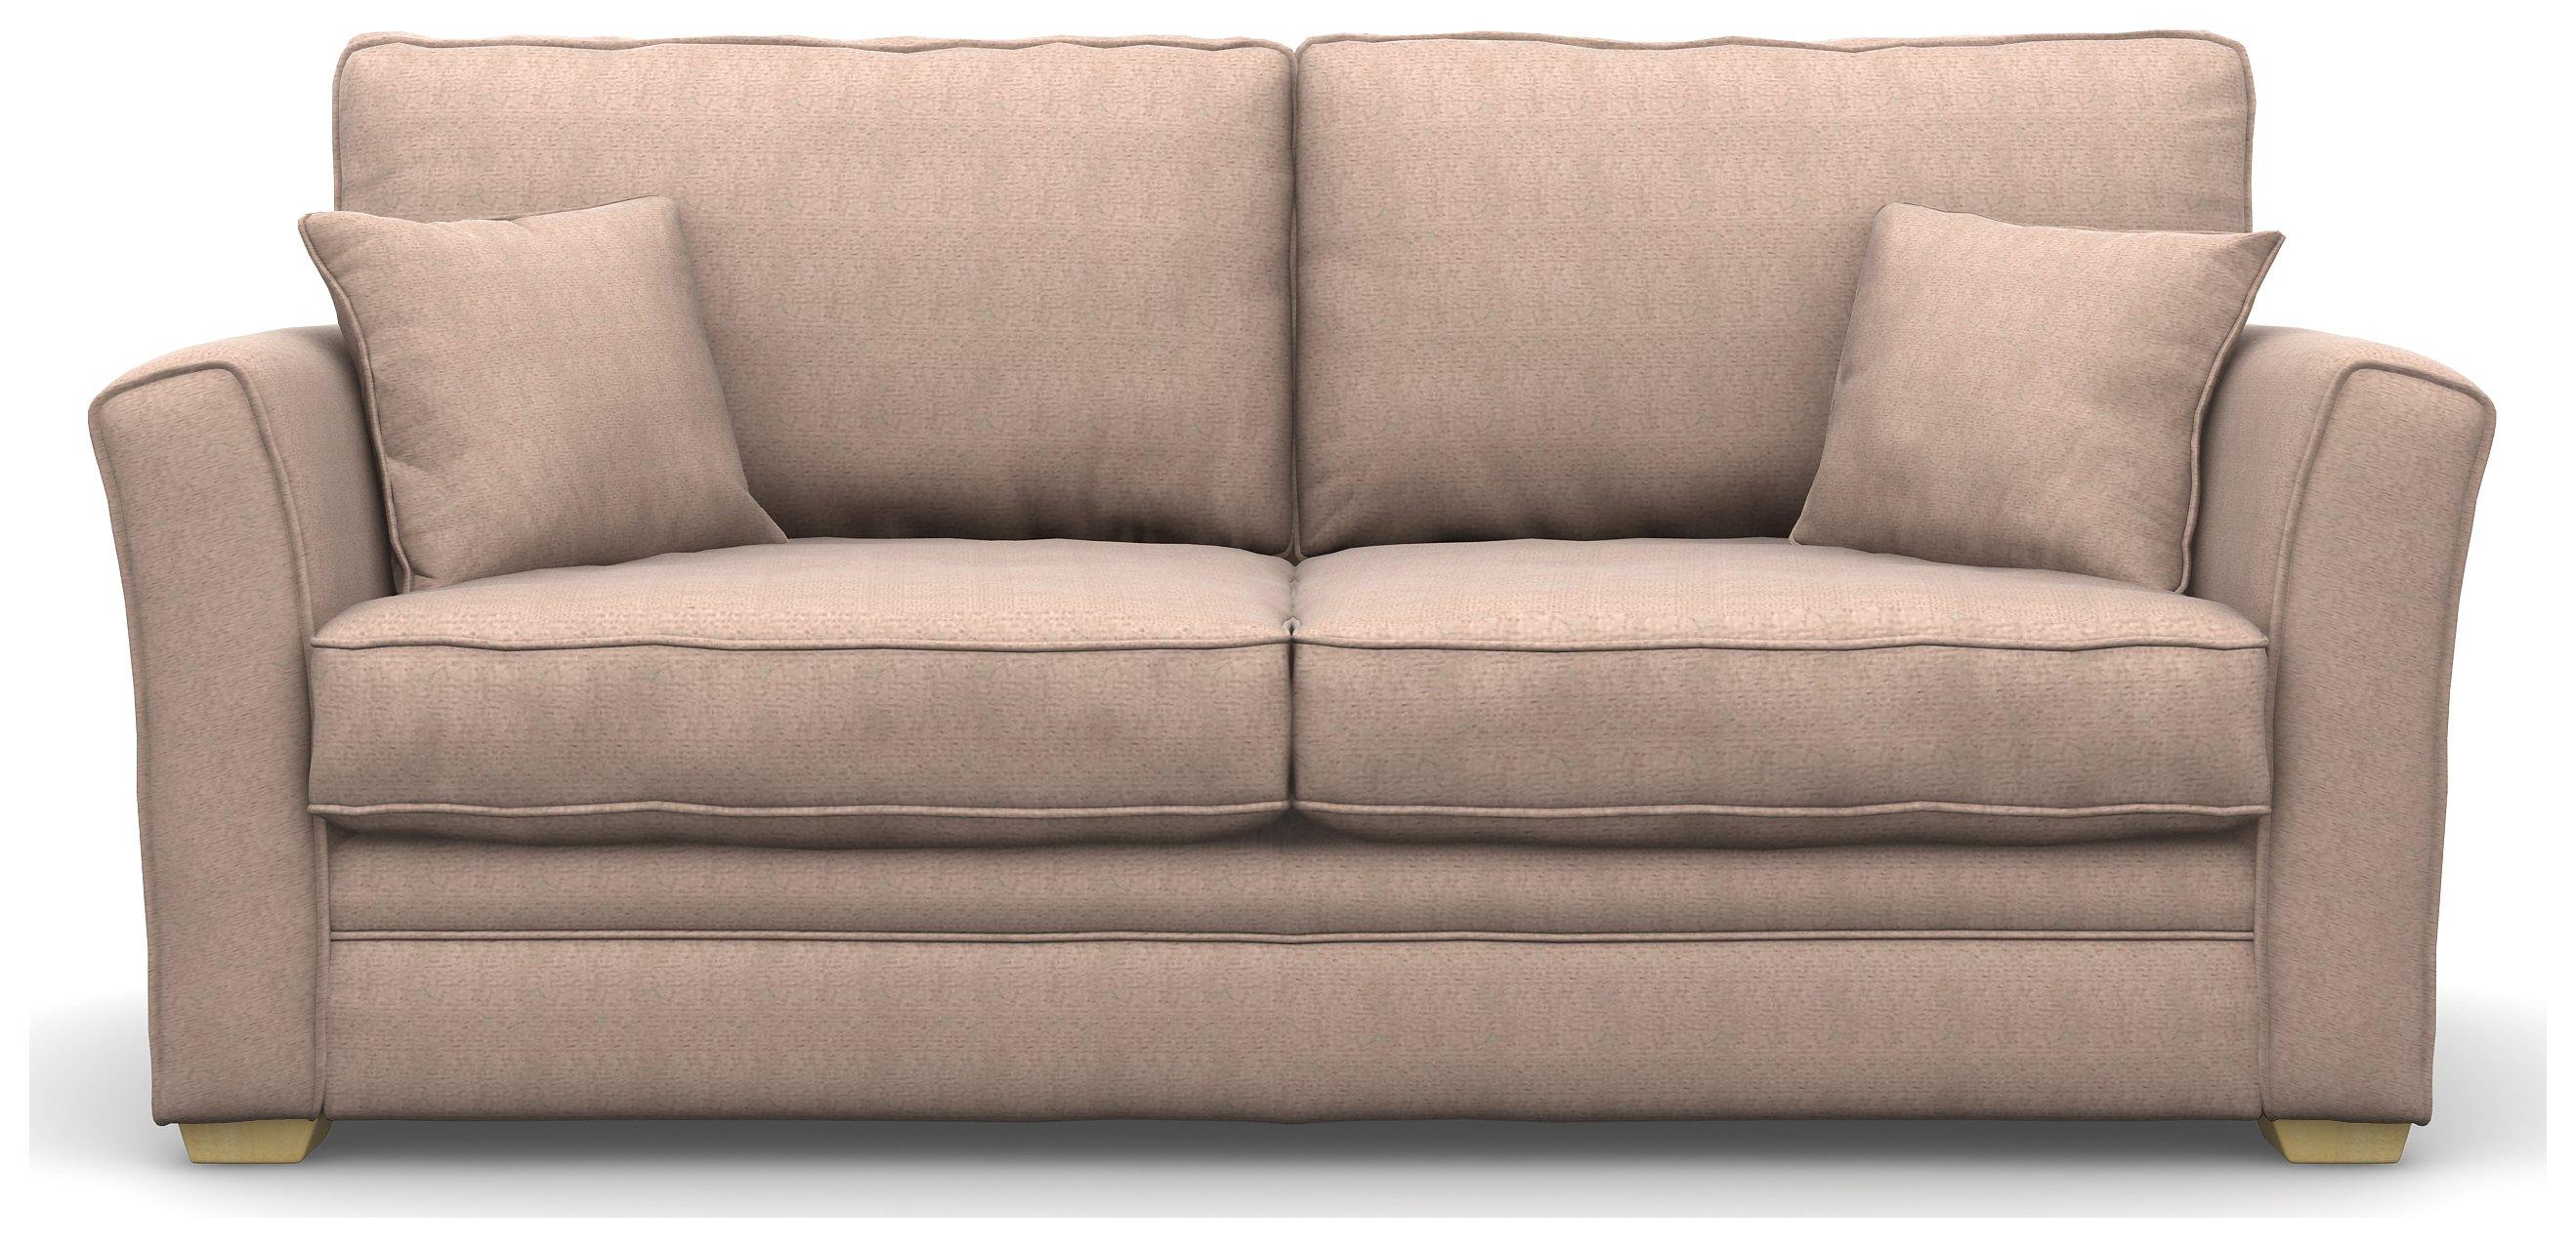 Heart of House Malton 3 Seater Fabric Sofa - Stone